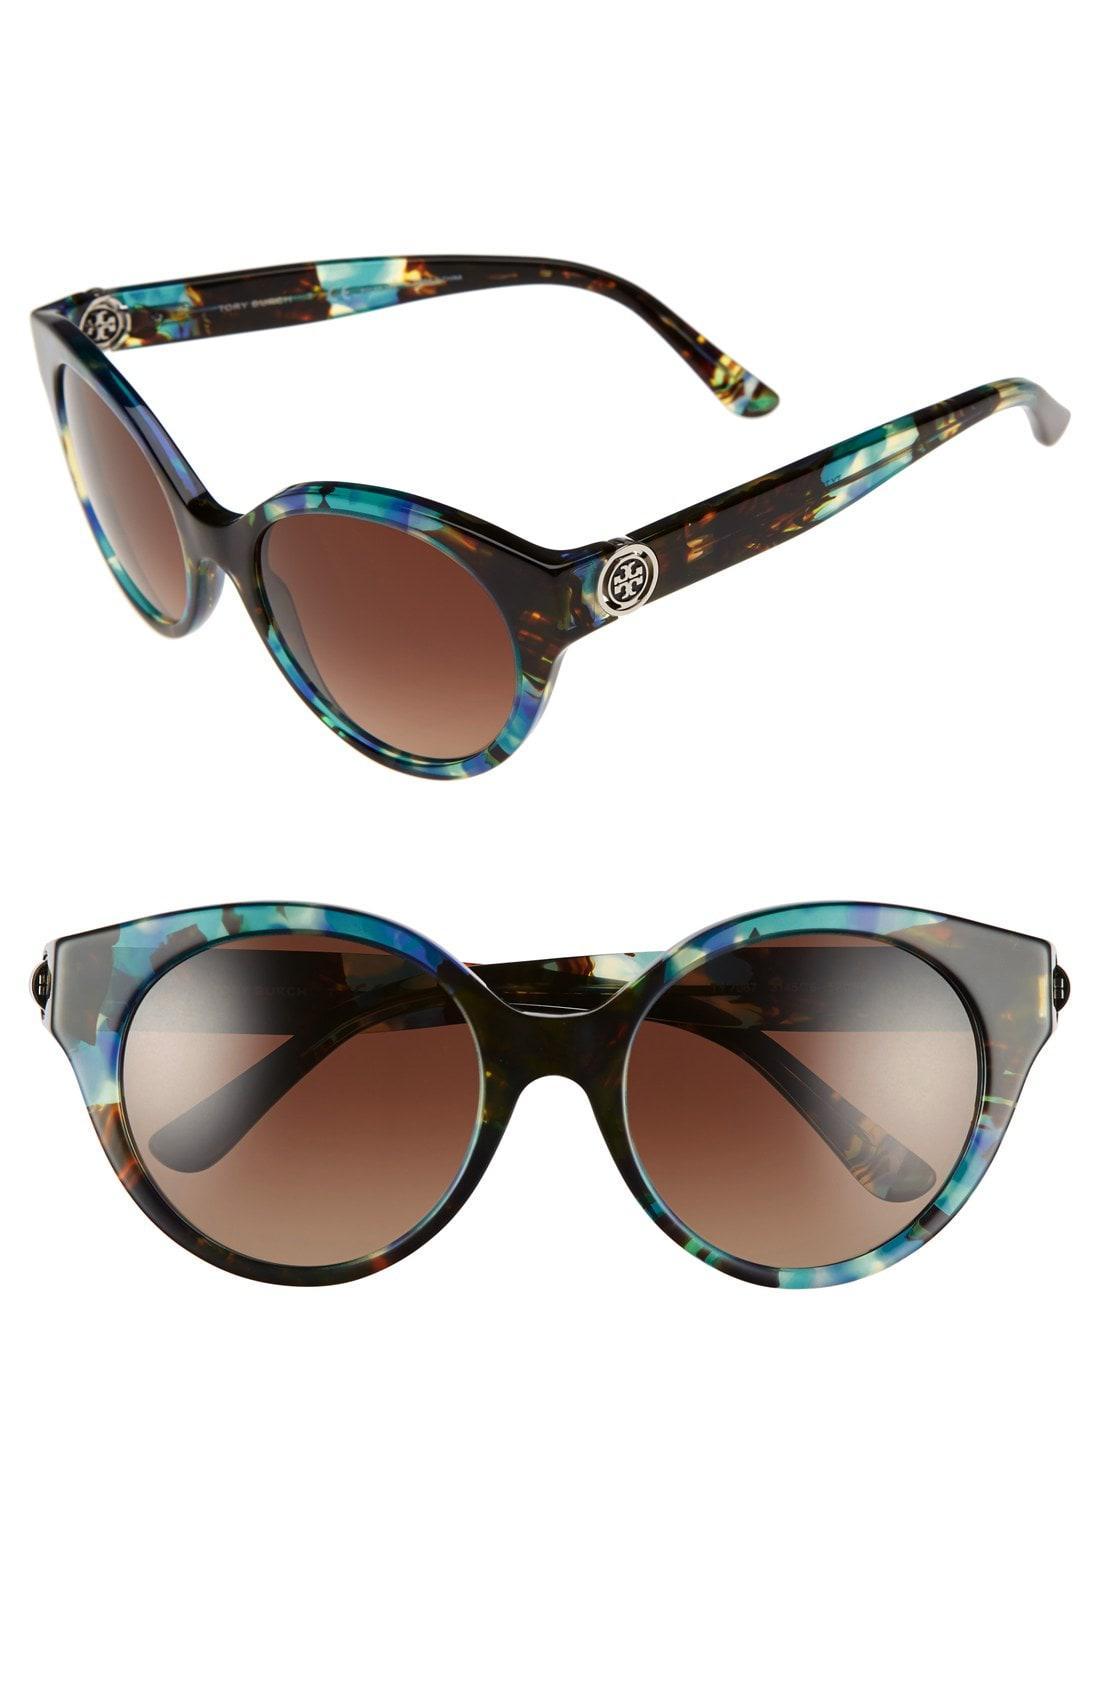 b17377fd1073 Lyst - Tory Burch 52mm Polarized Cat Eye Sunglasses - Tort Blue in Blue